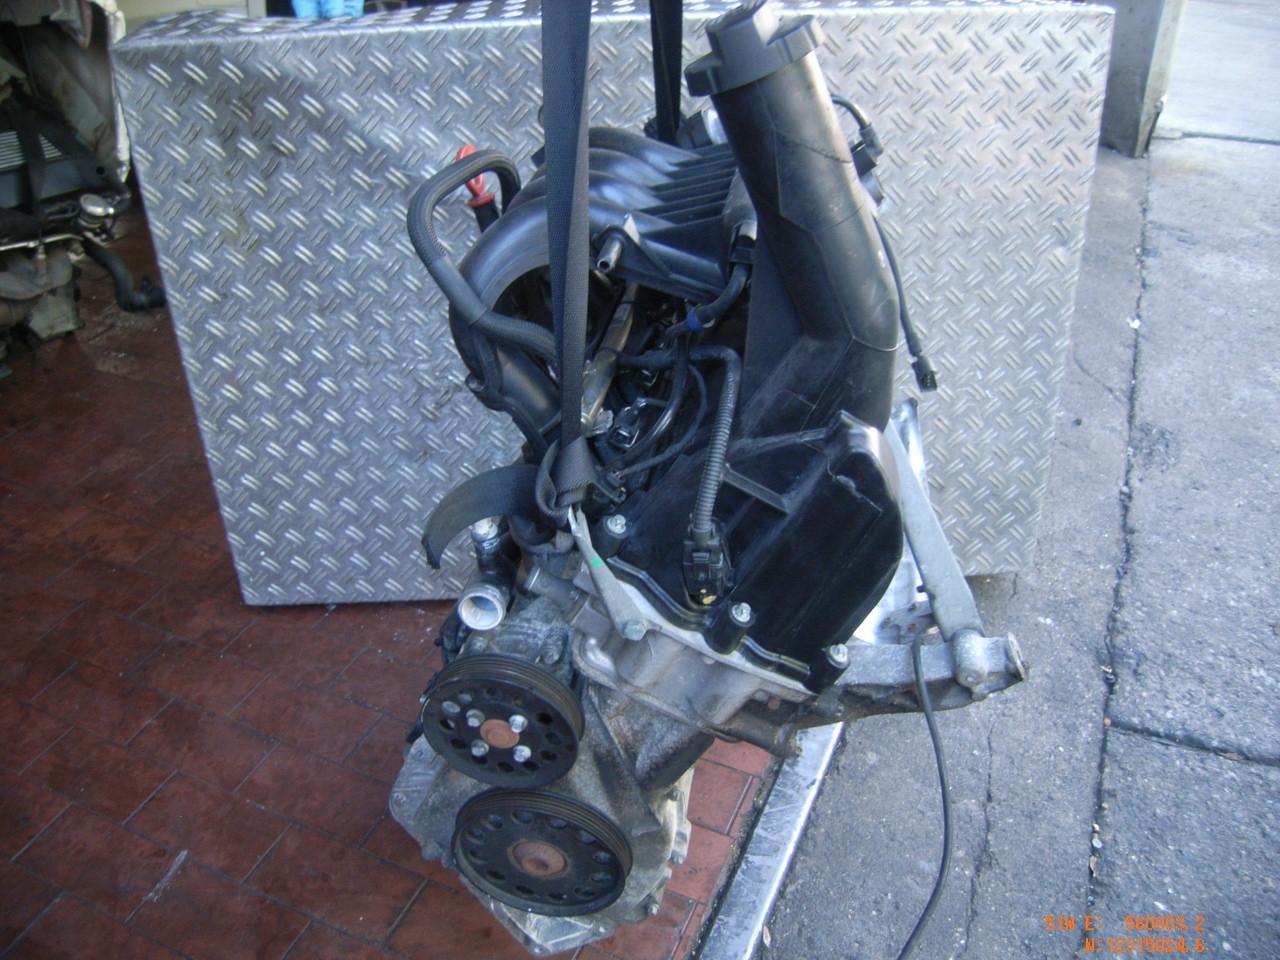 447133 motor ohne anbauteile benzin mercedes benz a. Black Bedroom Furniture Sets. Home Design Ideas